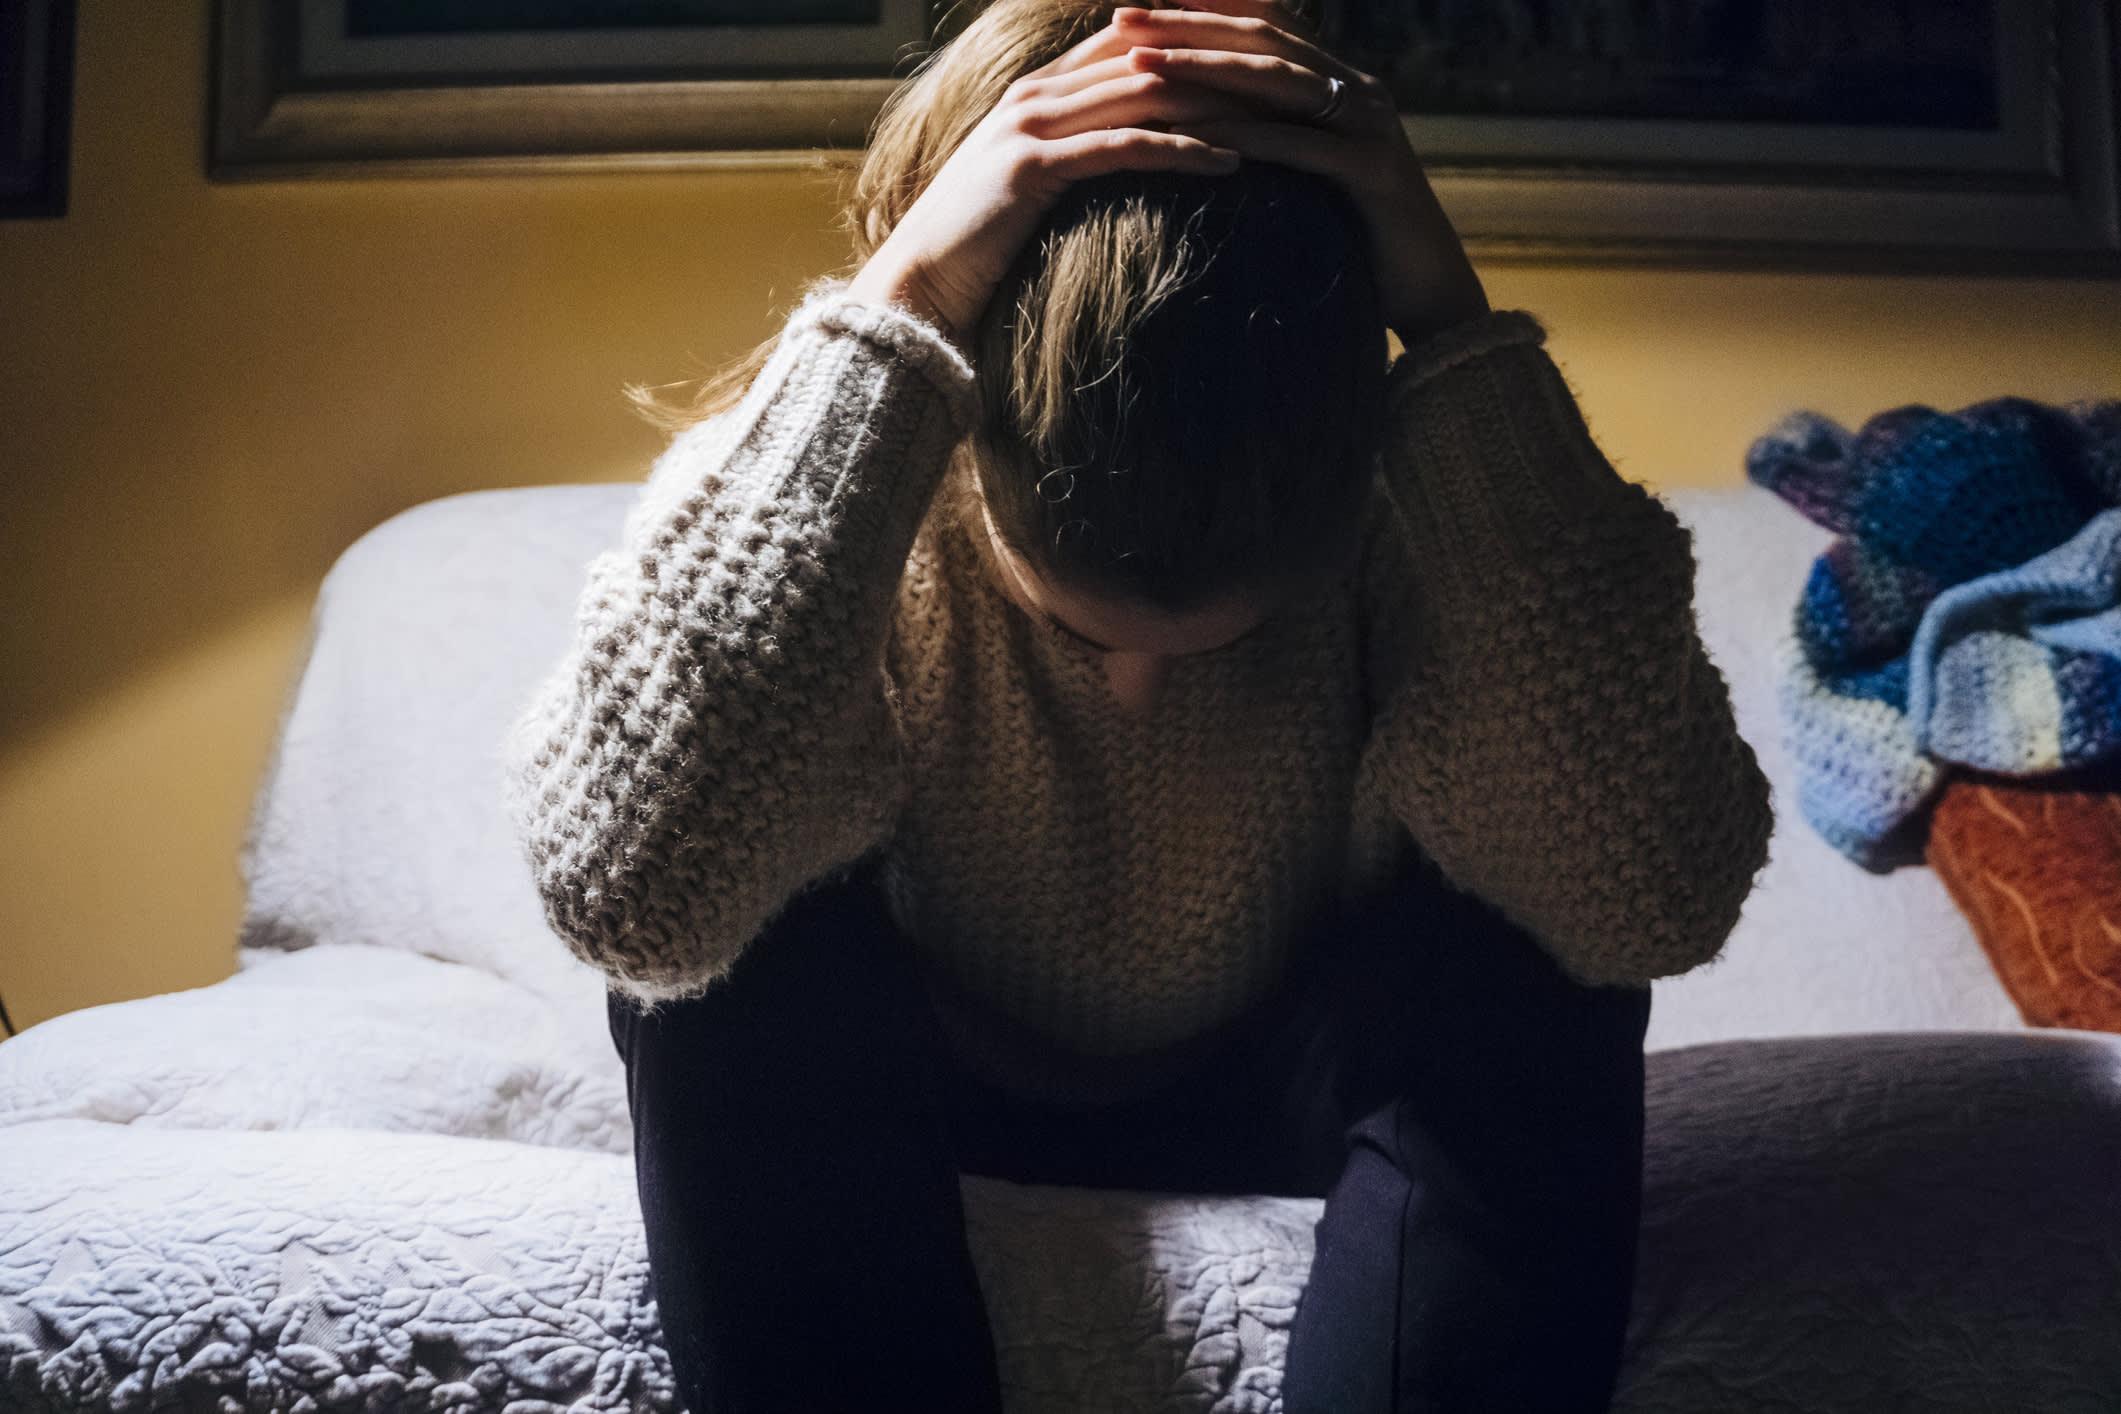 AA meetings, addiction counseling move online amid coronavirus outbreak